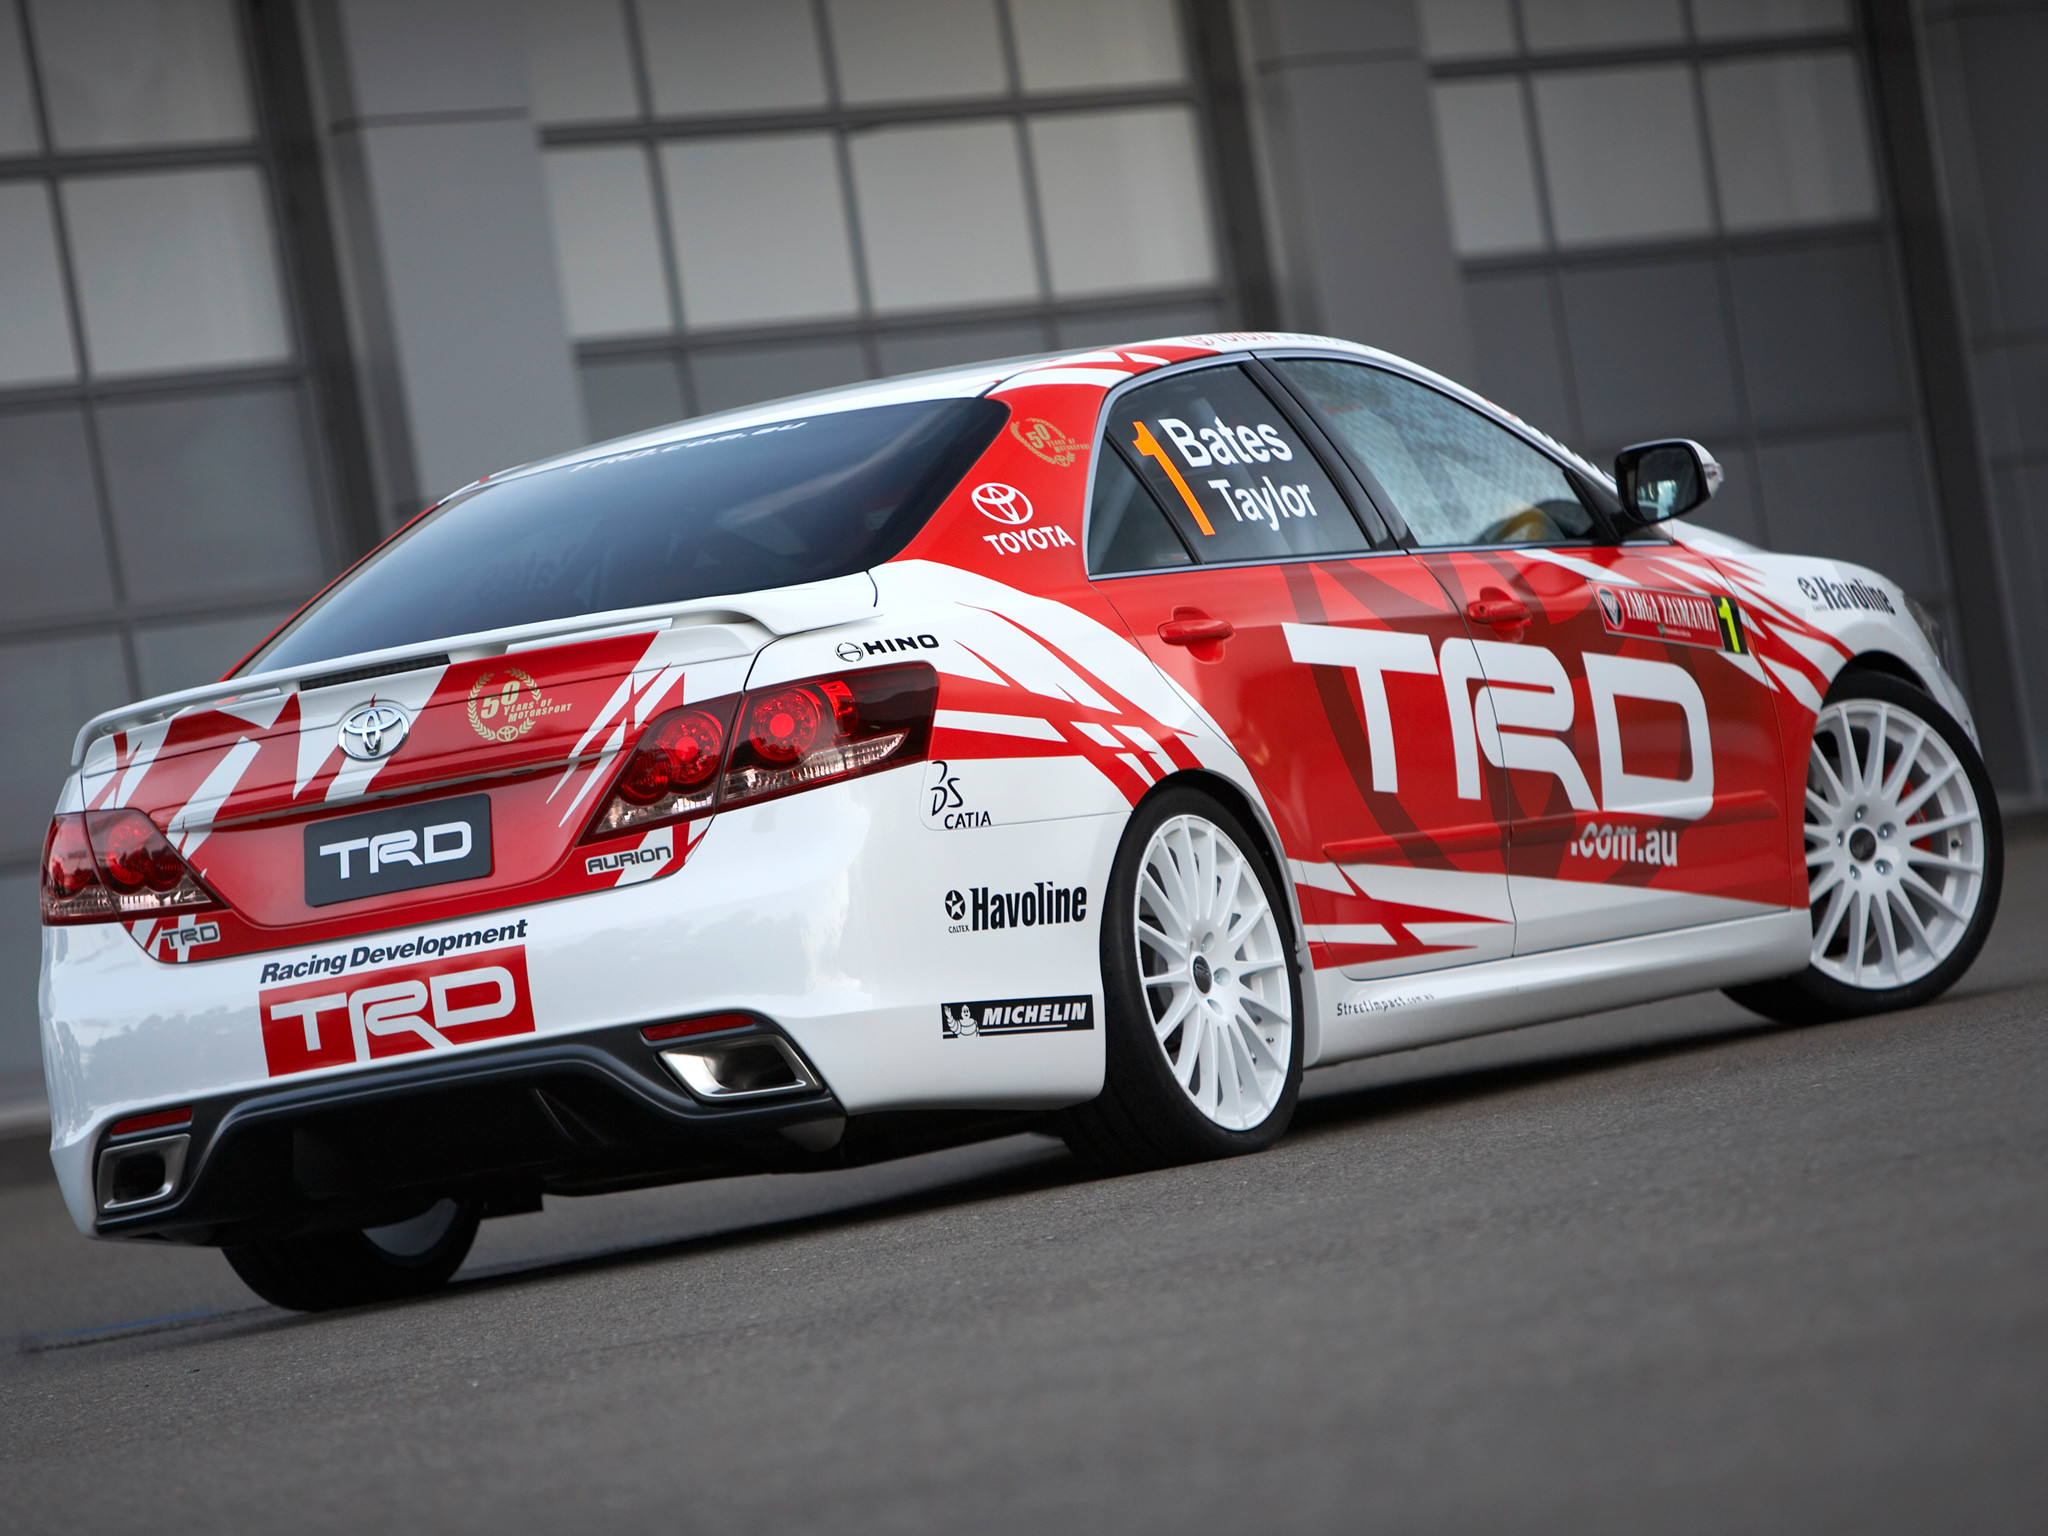 2007 TRD Toyota Aurion Race XV40 racing tuning e wallpaper | |  126005 | WallpaperUP